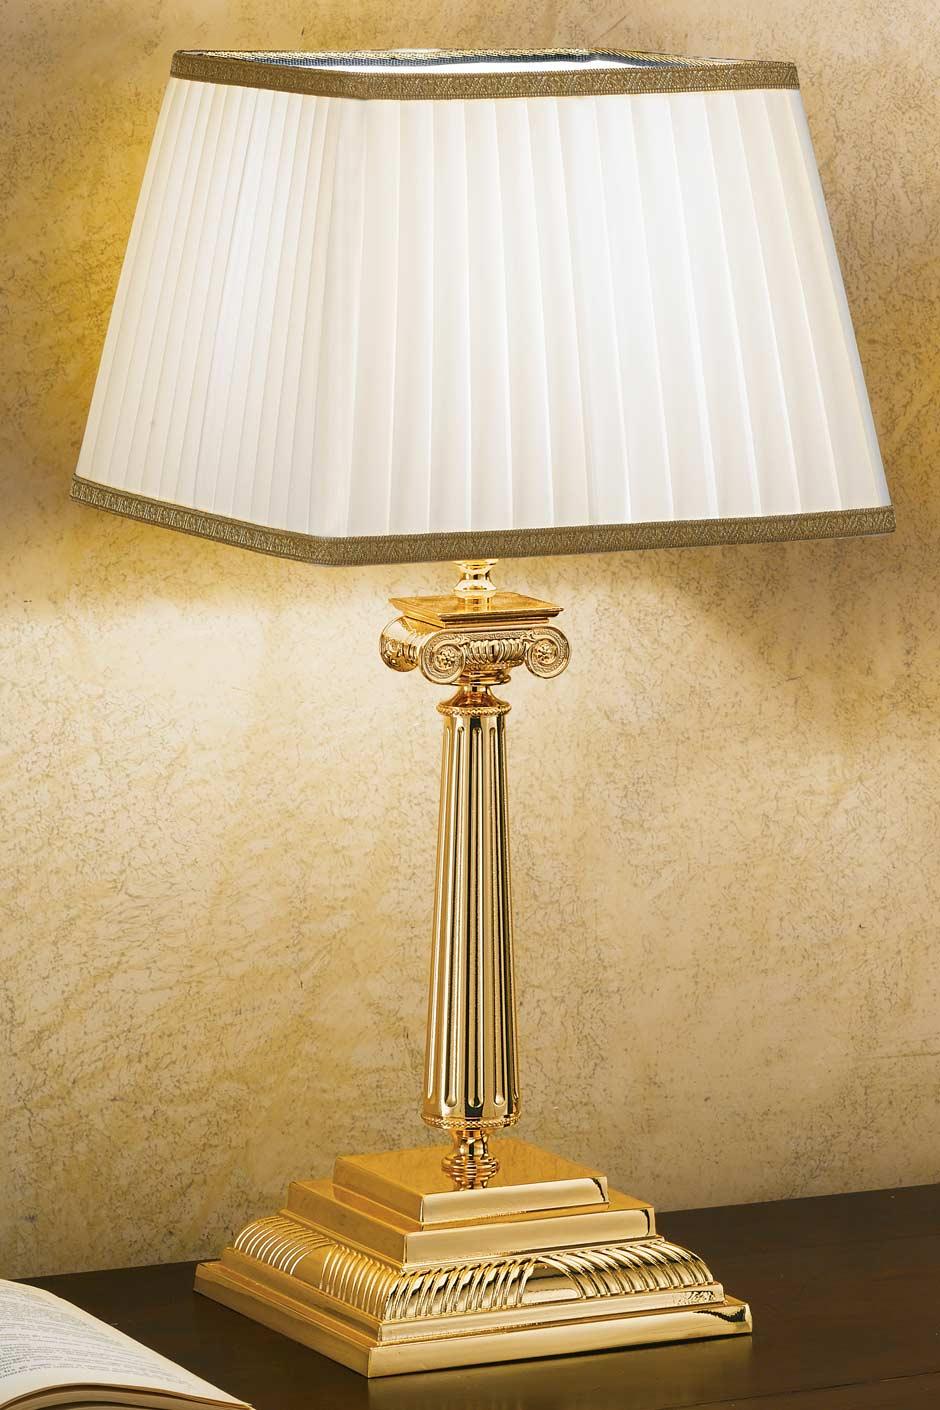 lampe bronze dor pied carr masiero sp cialiste du. Black Bedroom Furniture Sets. Home Design Ideas